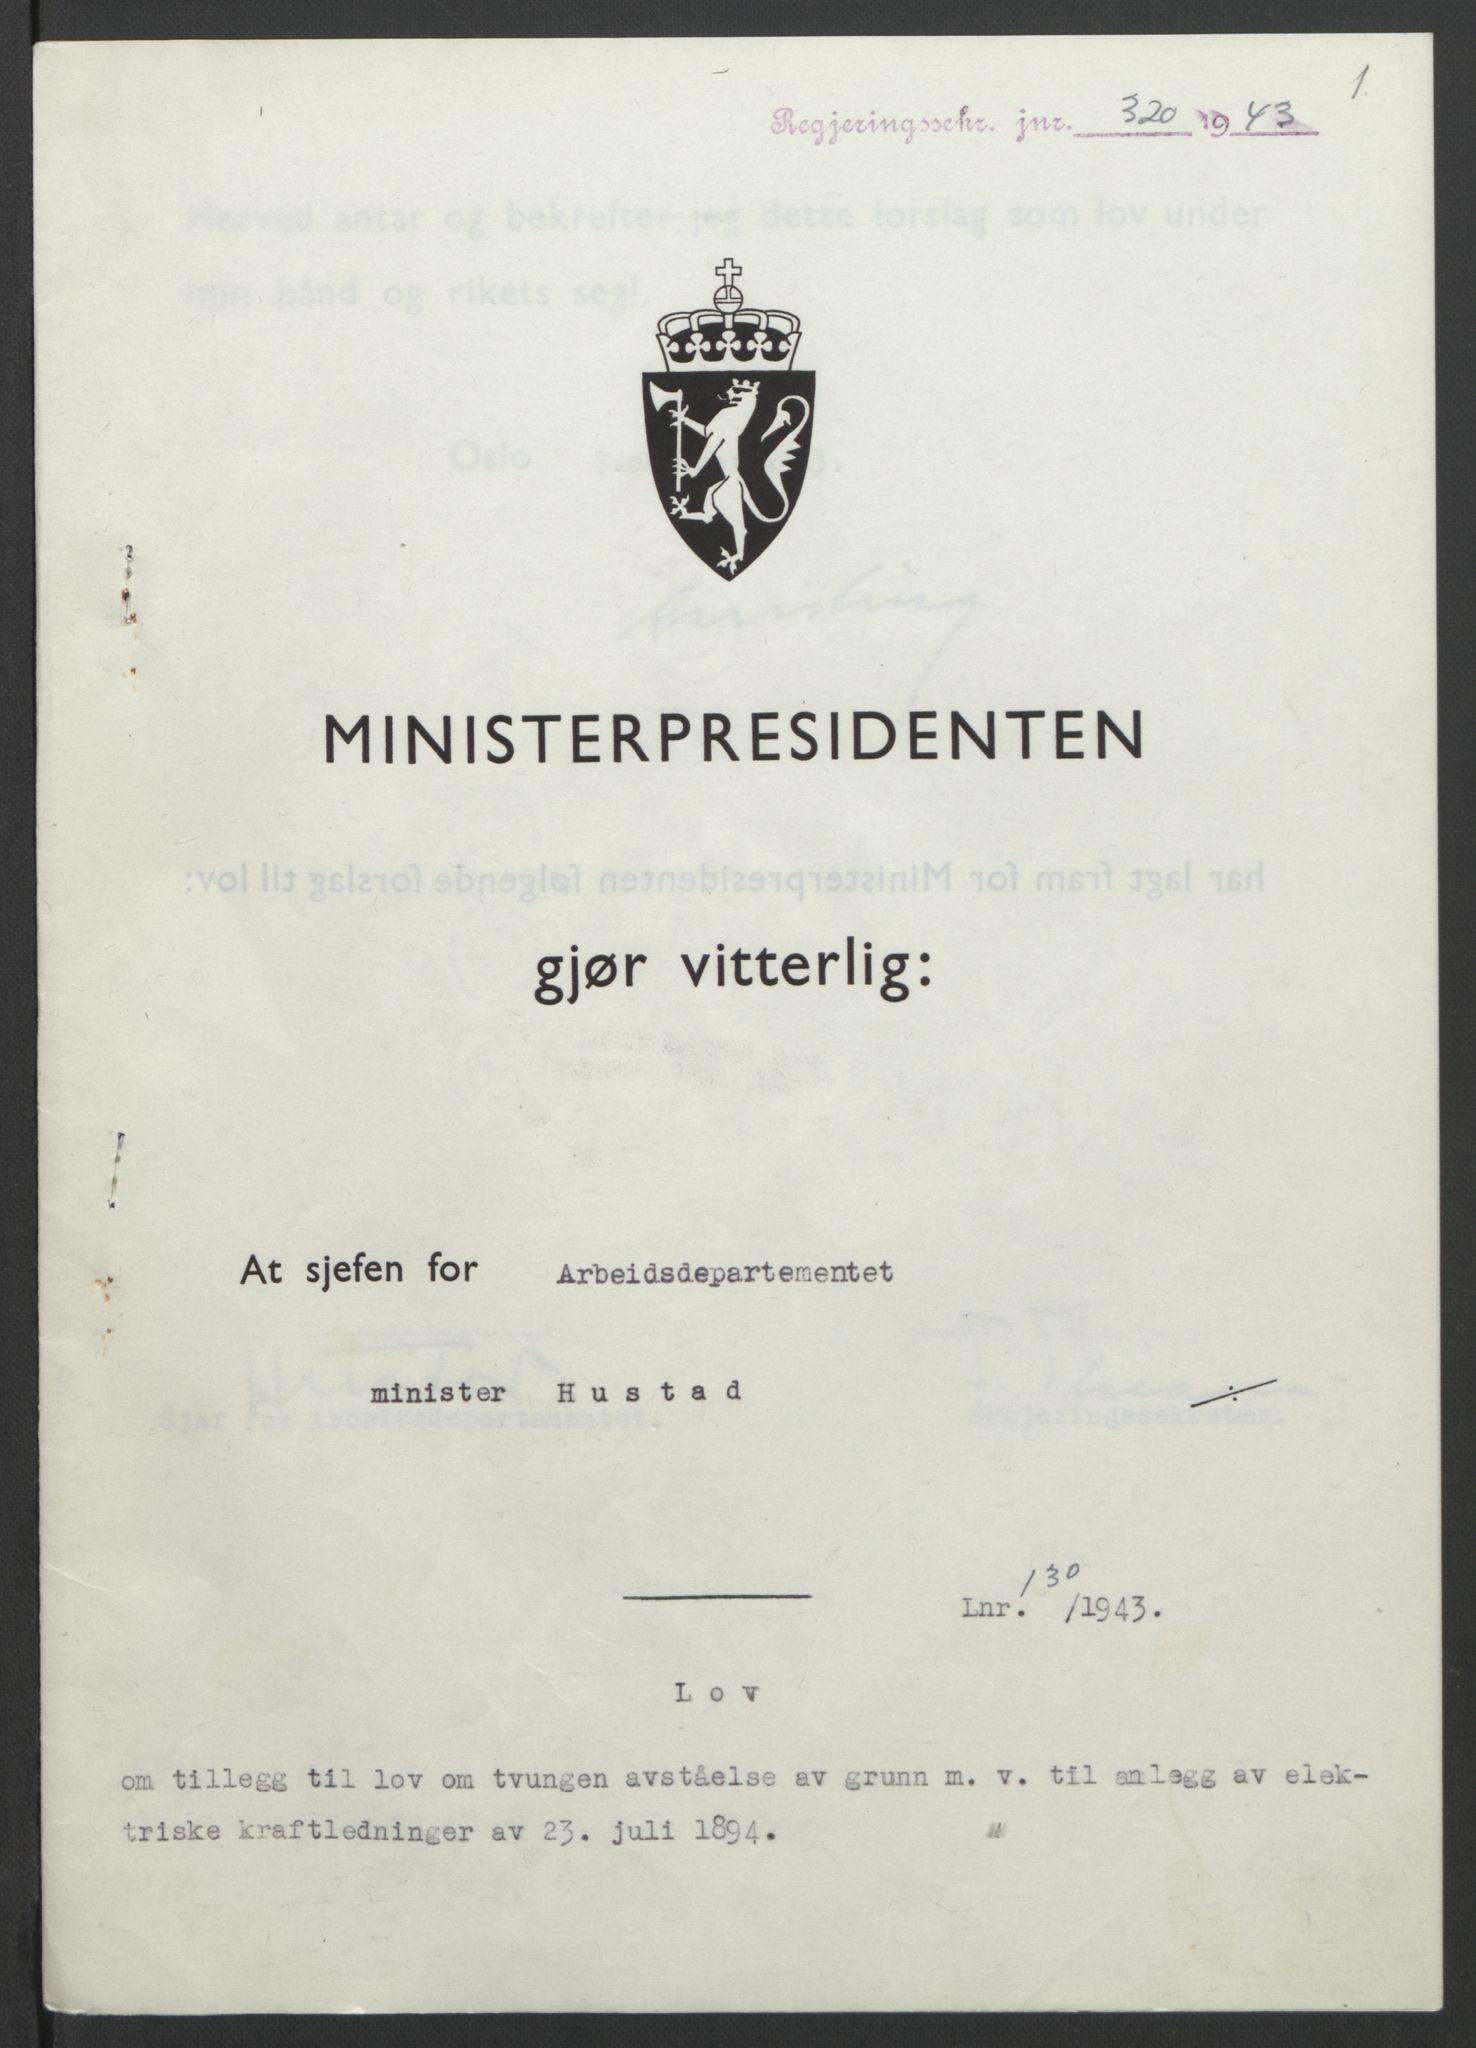 RA, NS-administrasjonen 1940-1945 (Statsrådsekretariatet, de kommisariske statsråder mm), D/Db/L0099: Lover, 1943, s. 608